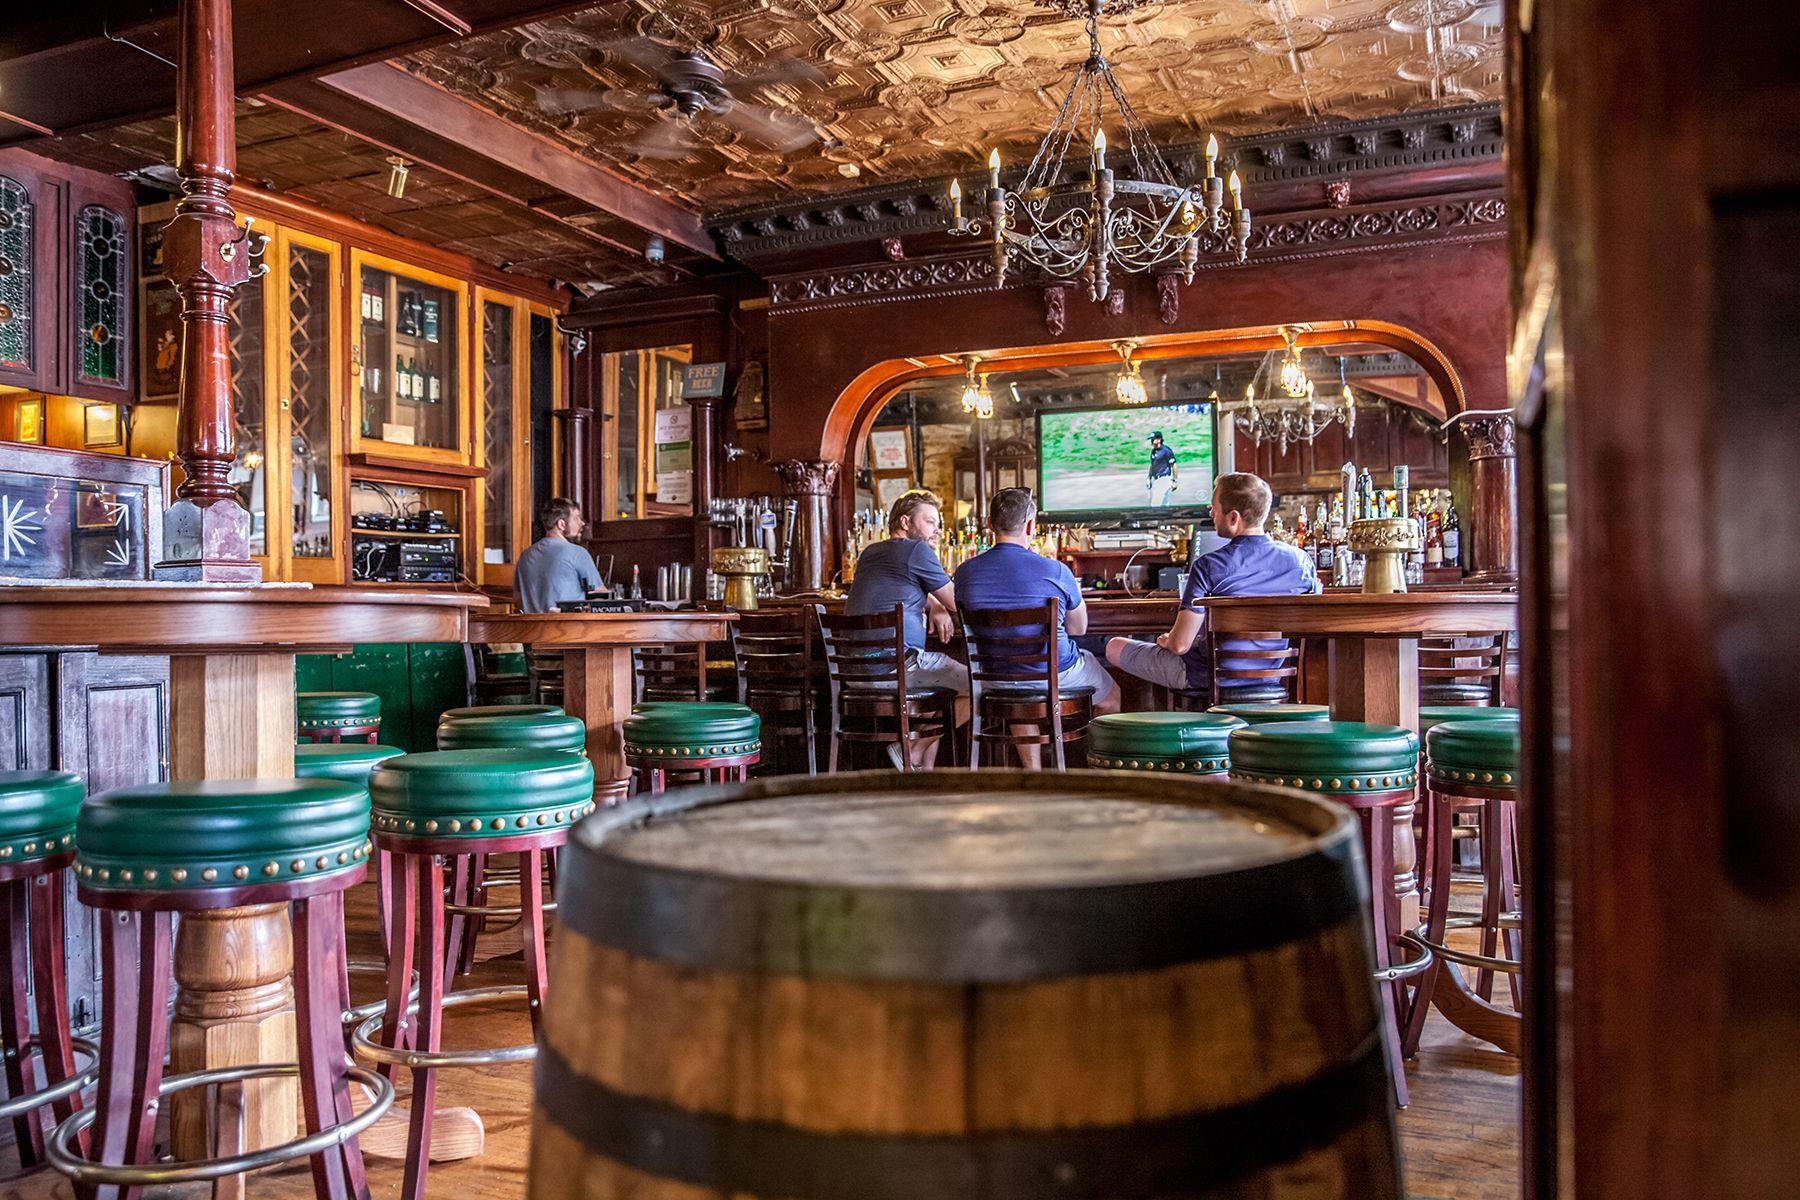 irish nobleman commercial bar designers custom home bar builders chicago - Commercial Bar Design Ideas